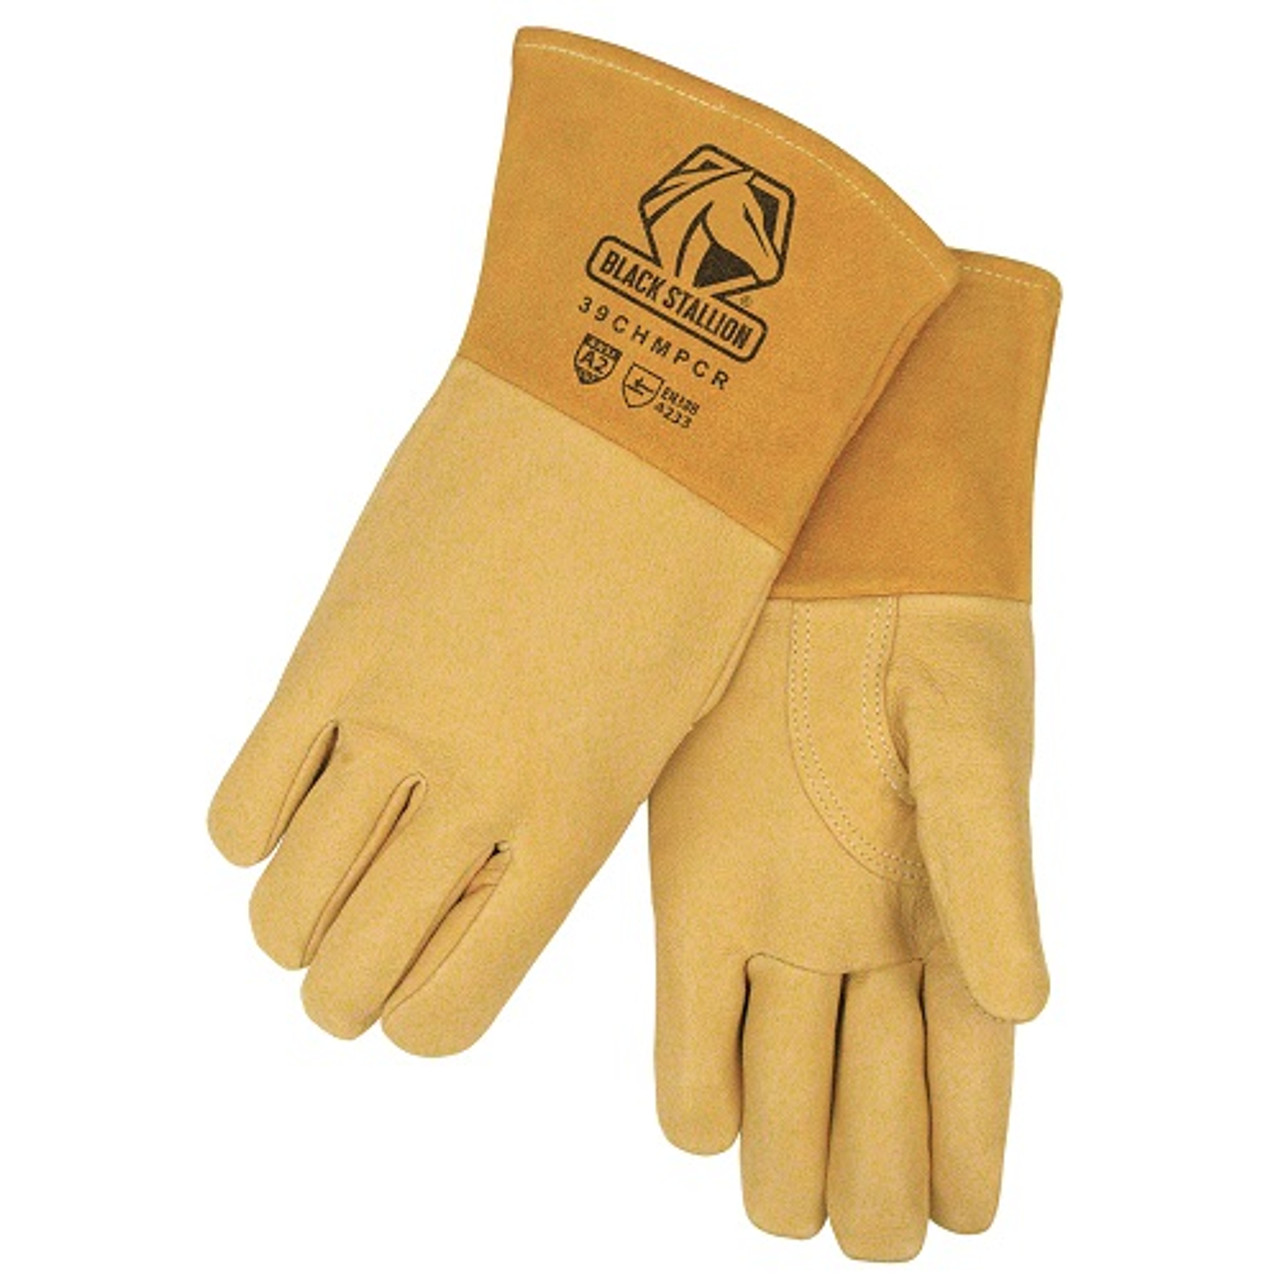 A2 Cut Resistant Pigskin MIG Glove